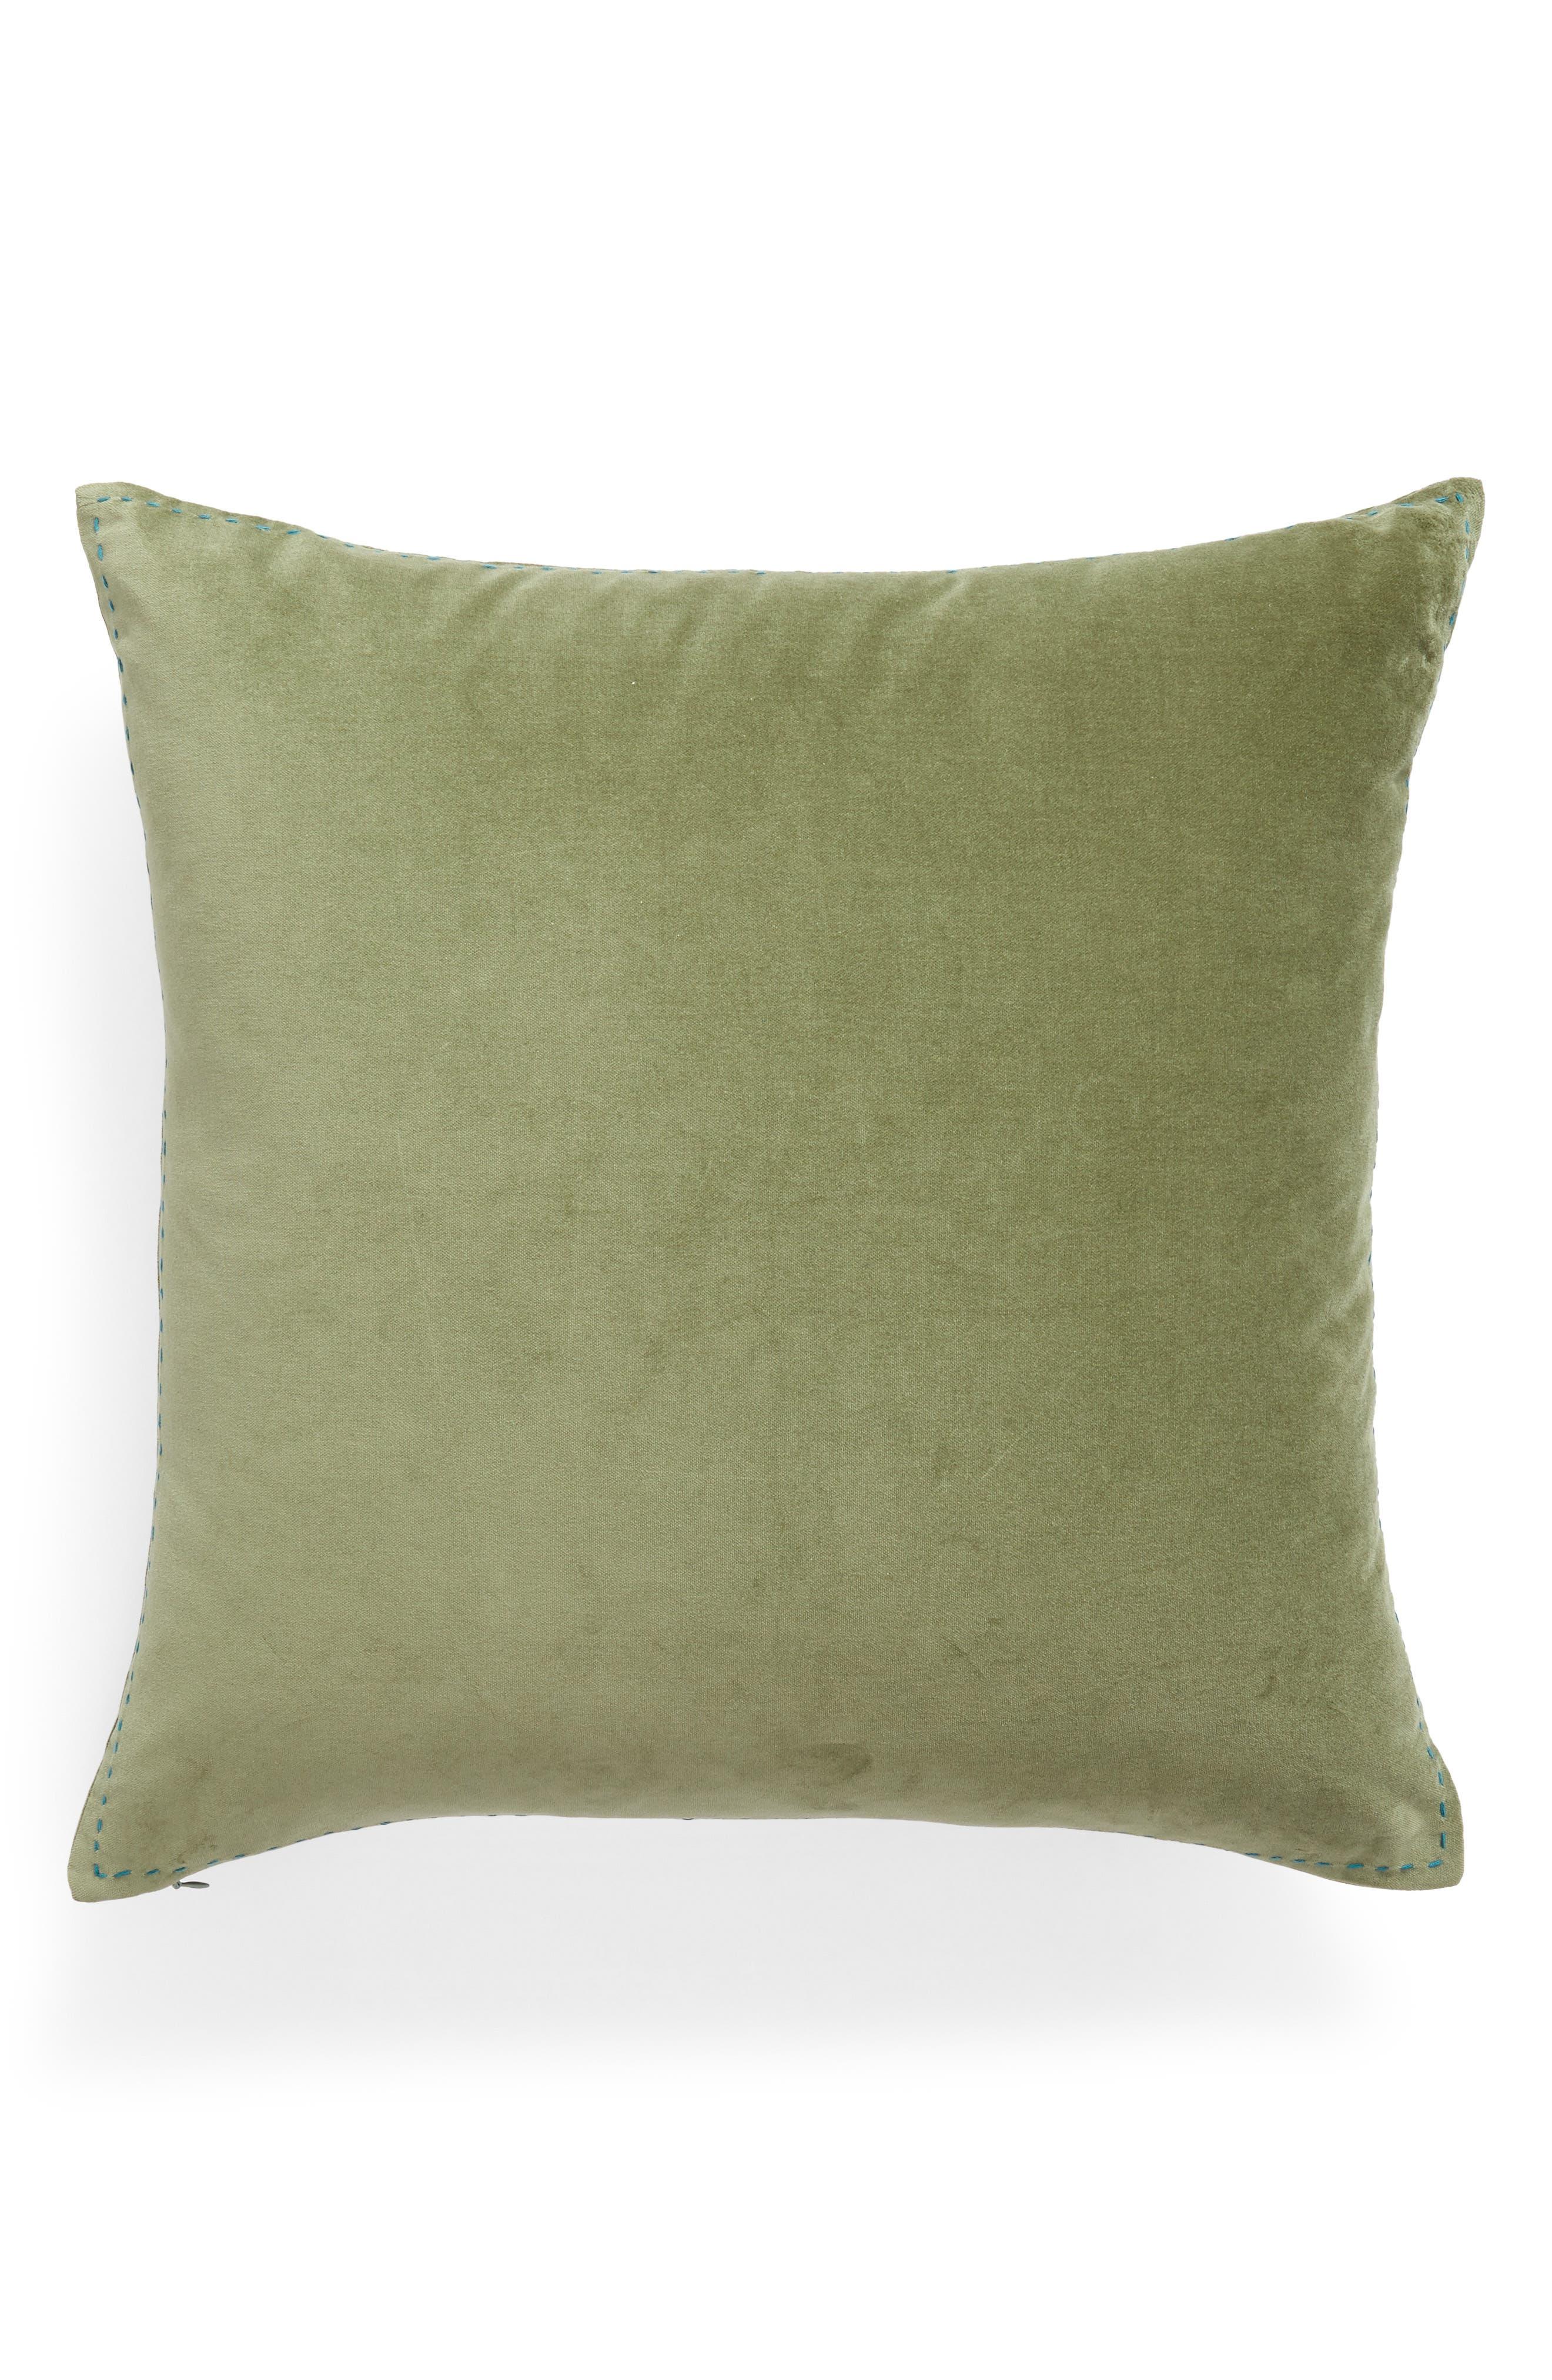 Ticking Border Accent Pillow,                         Main,                         color, Green Sorrel